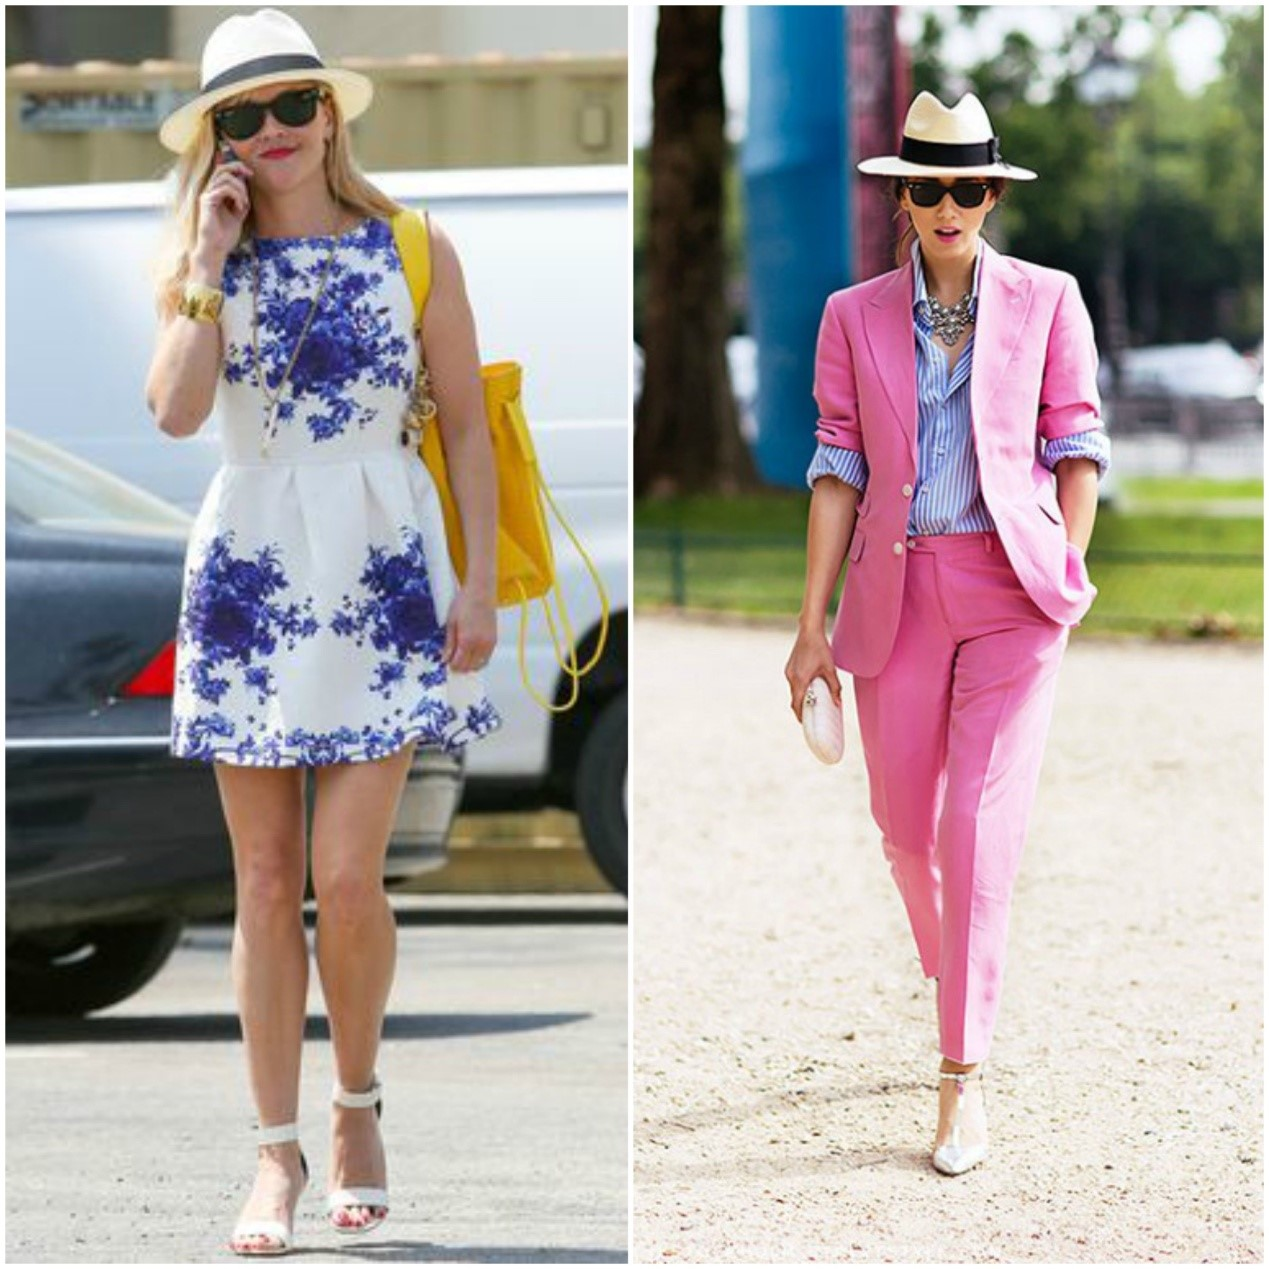 style-hatter-in-the-summer-savoir ville 2